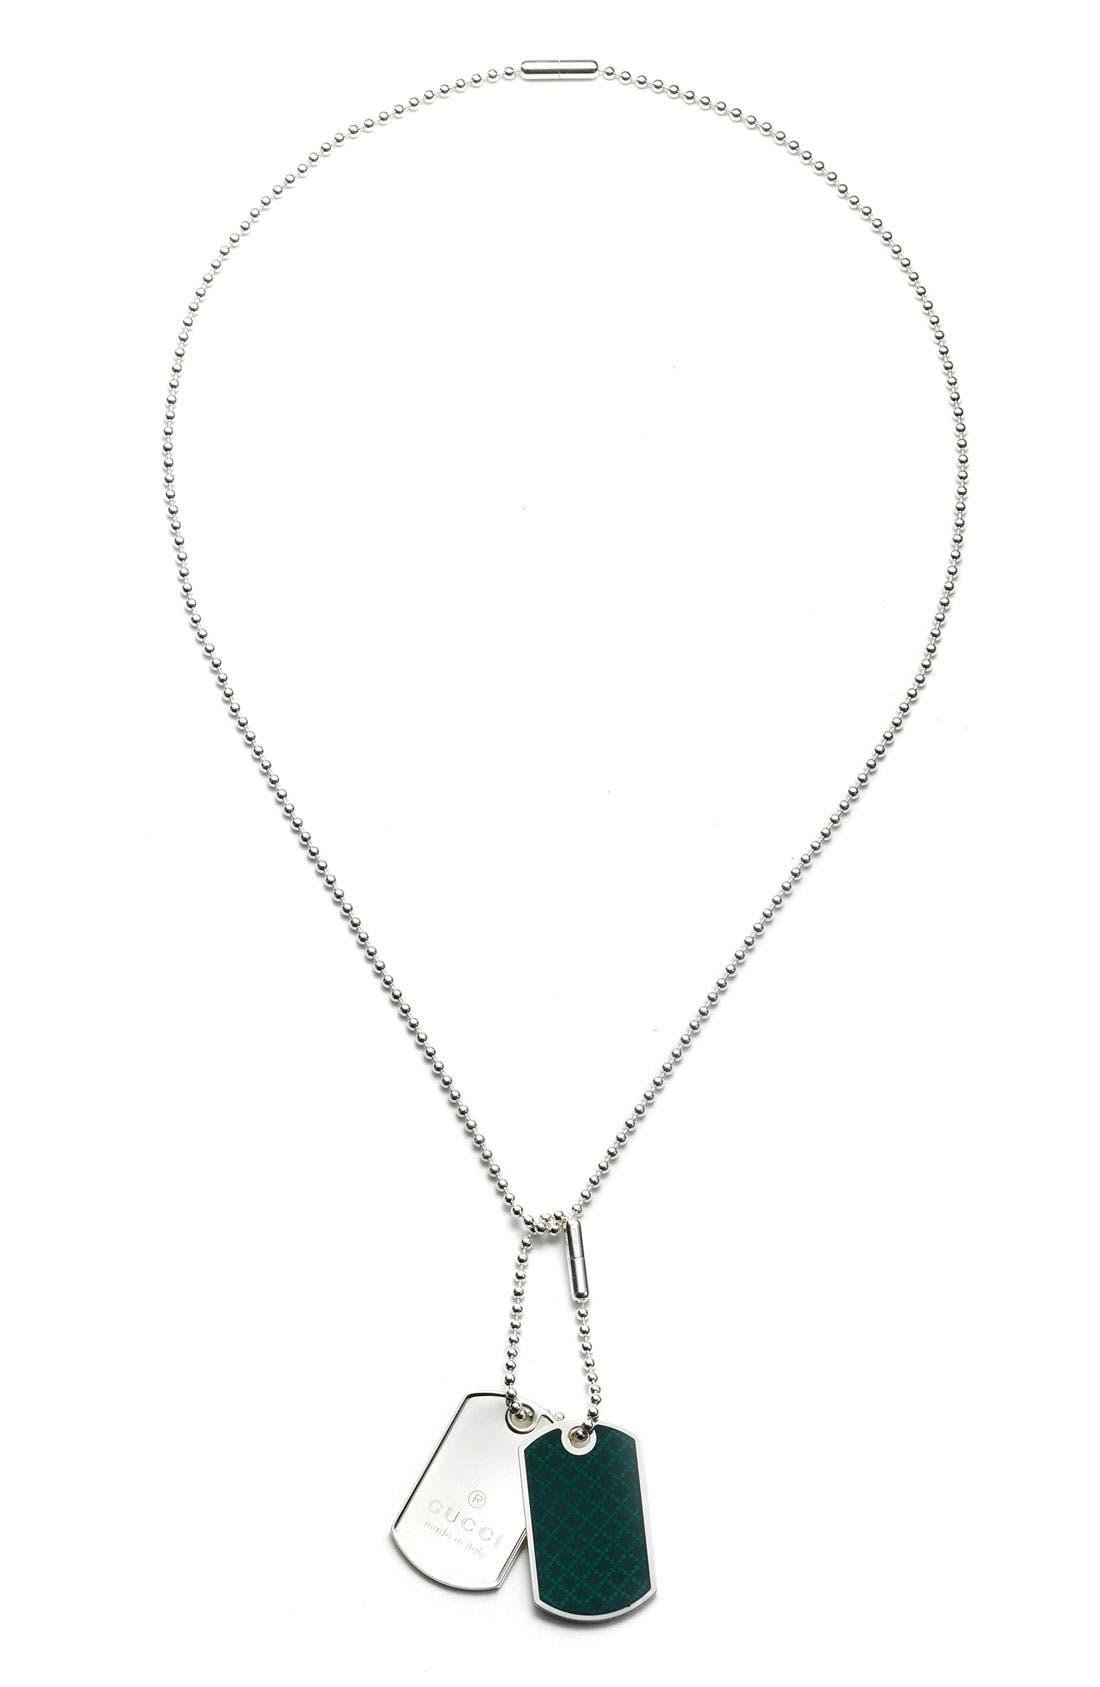 Main Image - Gucci Dog Tag Necklace